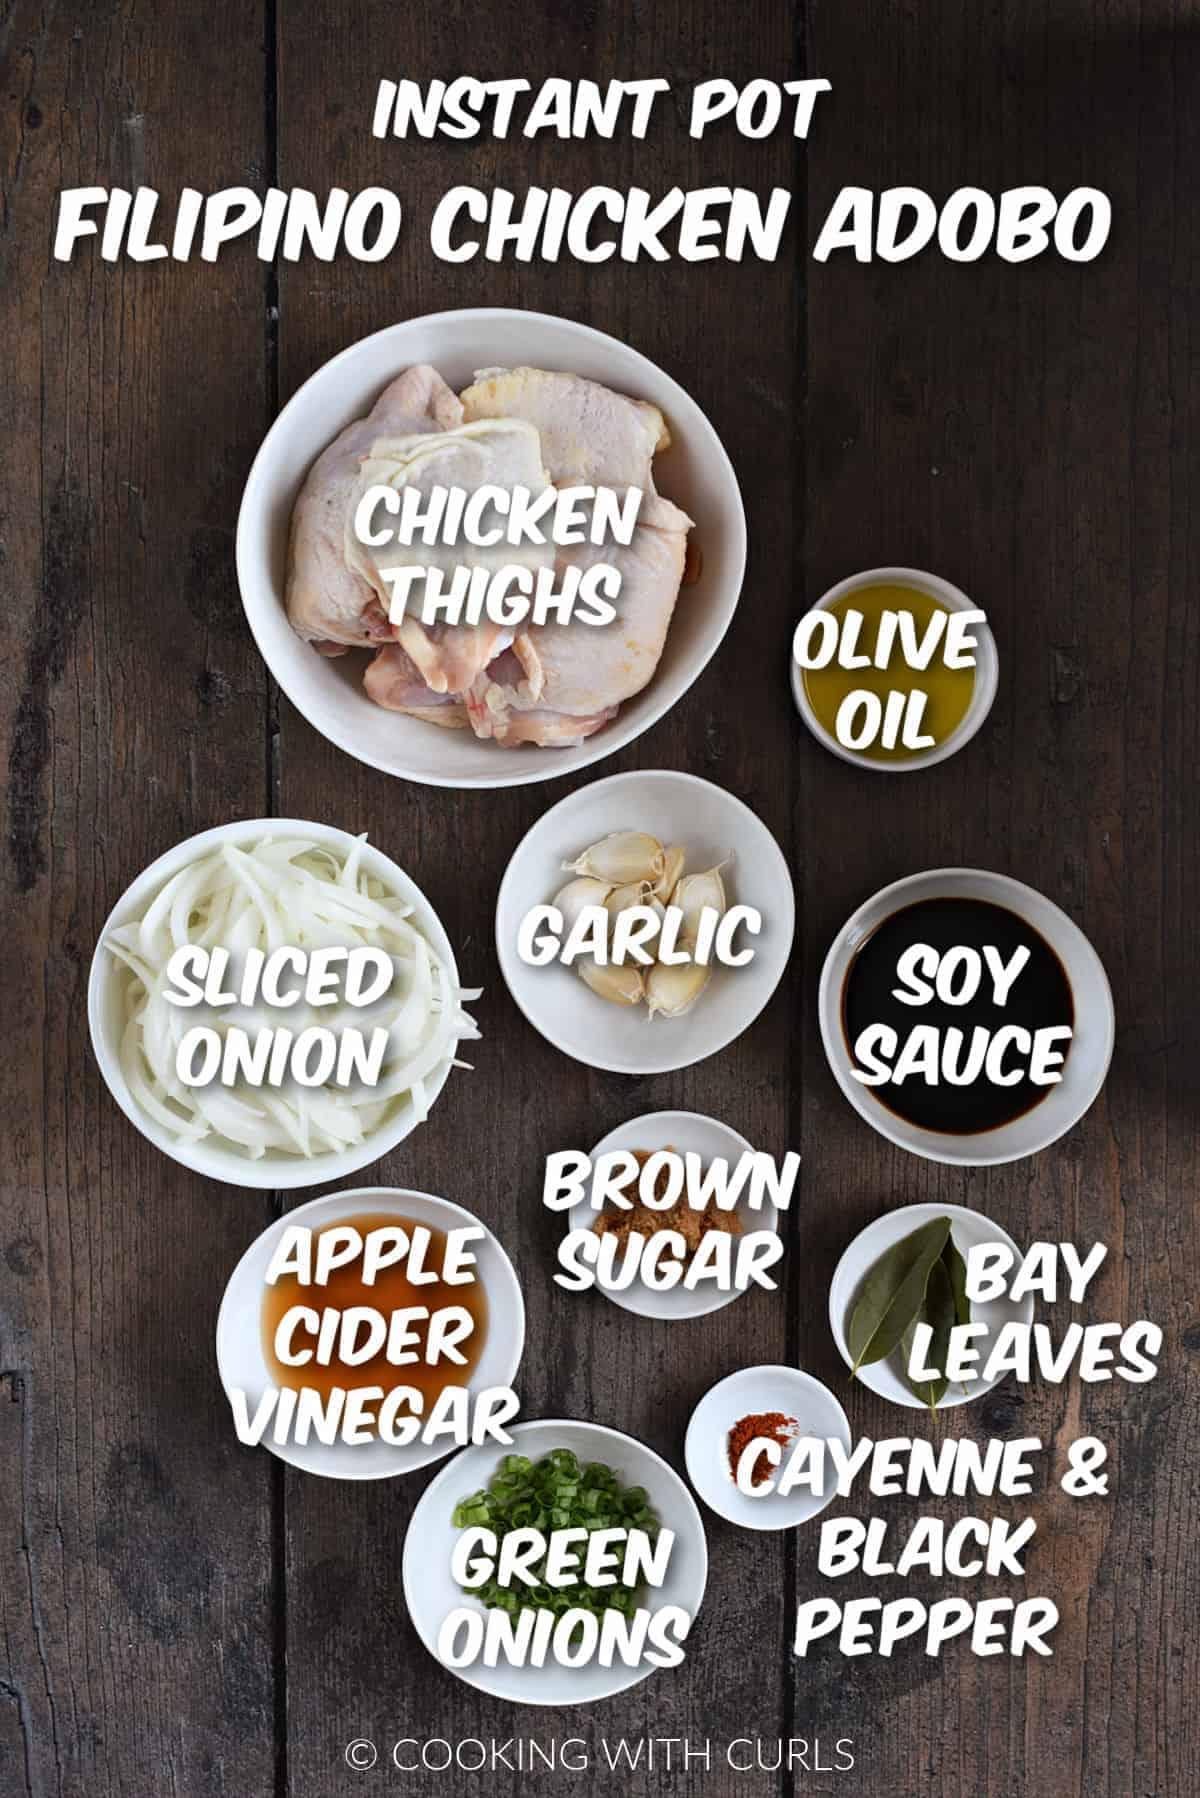 Ingredients to make instant pot filipino chicken adobo in white bowls.